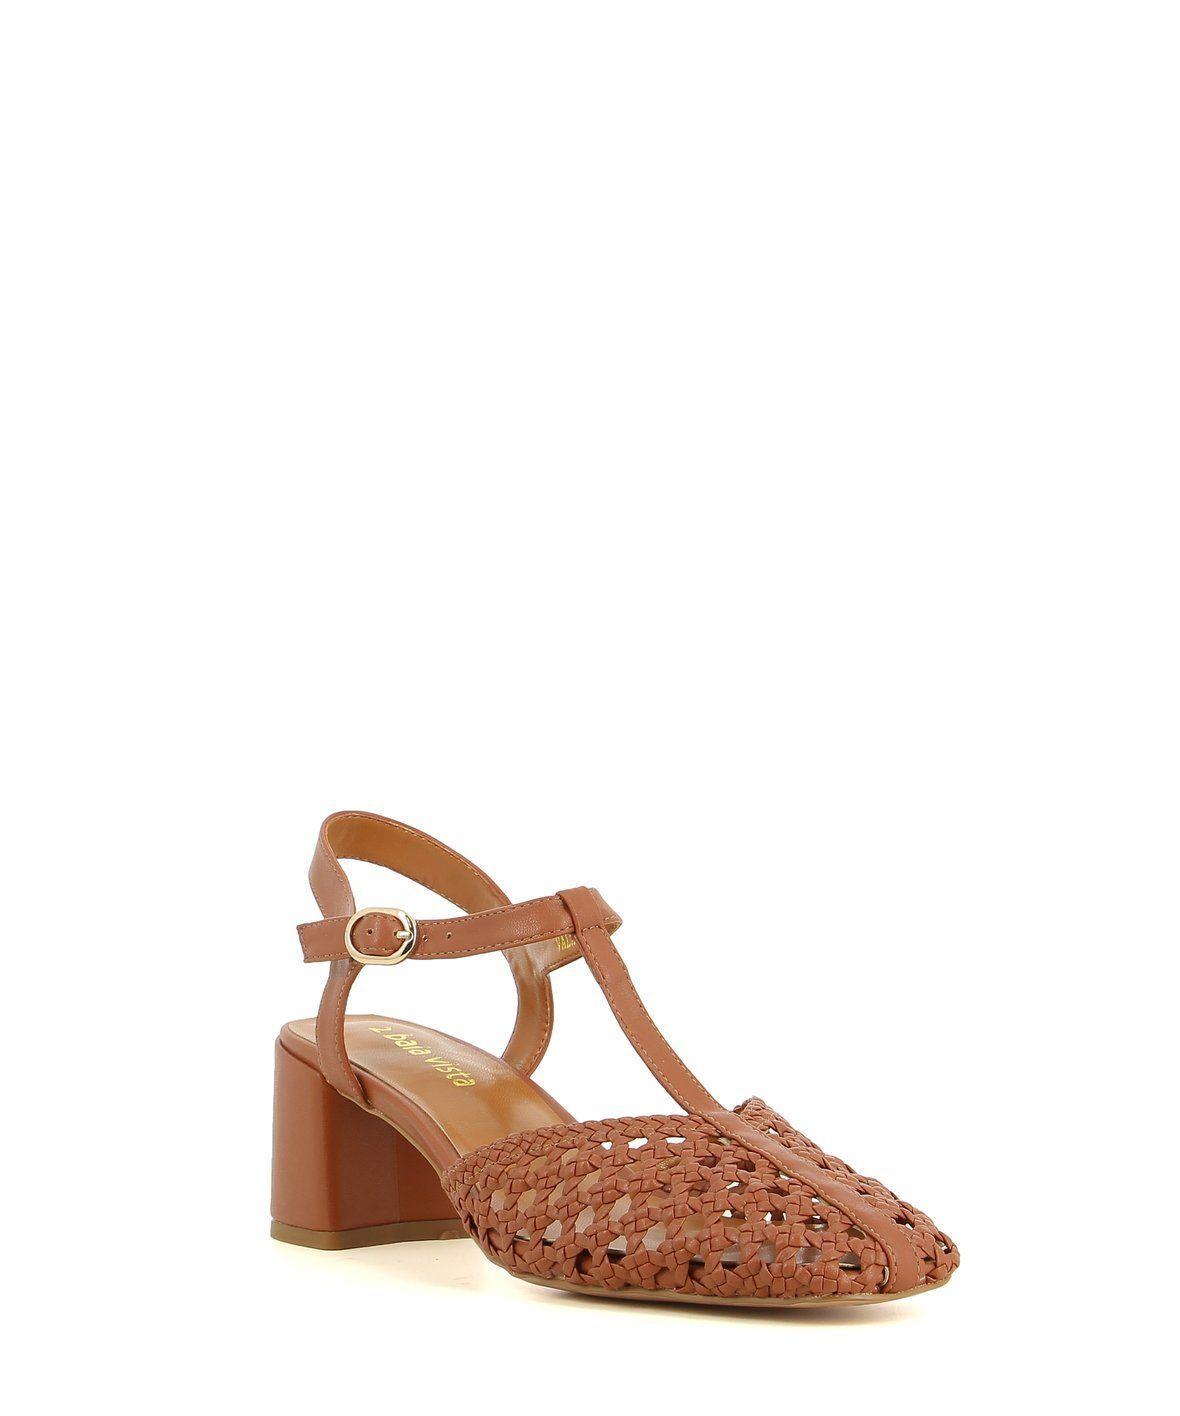 2 Baia Vista Vala Brandy Zomp Shoez In 2020 Woven Sandals Ankle Strap T Strap